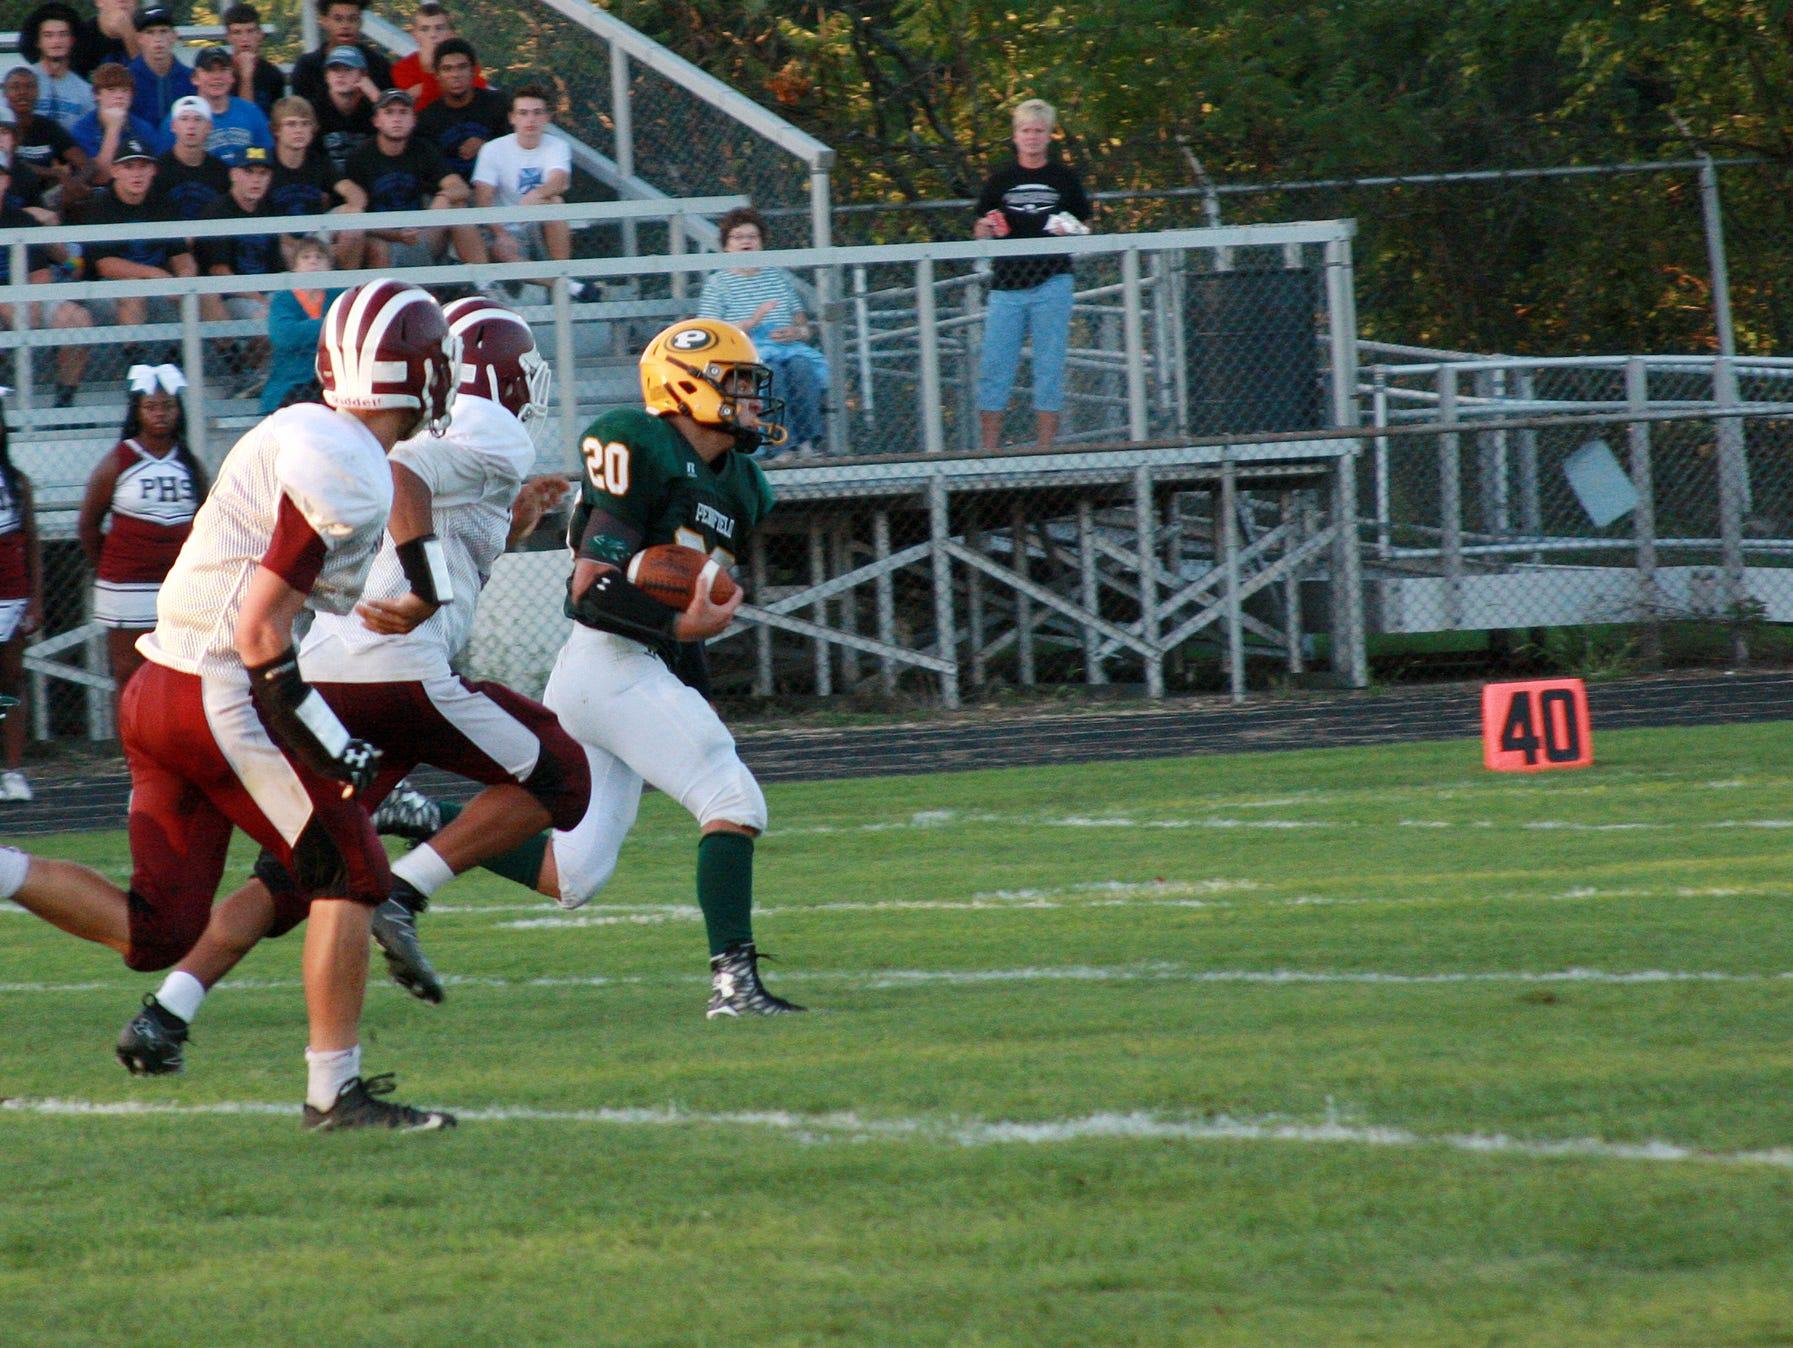 Pennfield junior Sam Nichols breaks loose for a touchdown Thursday evening